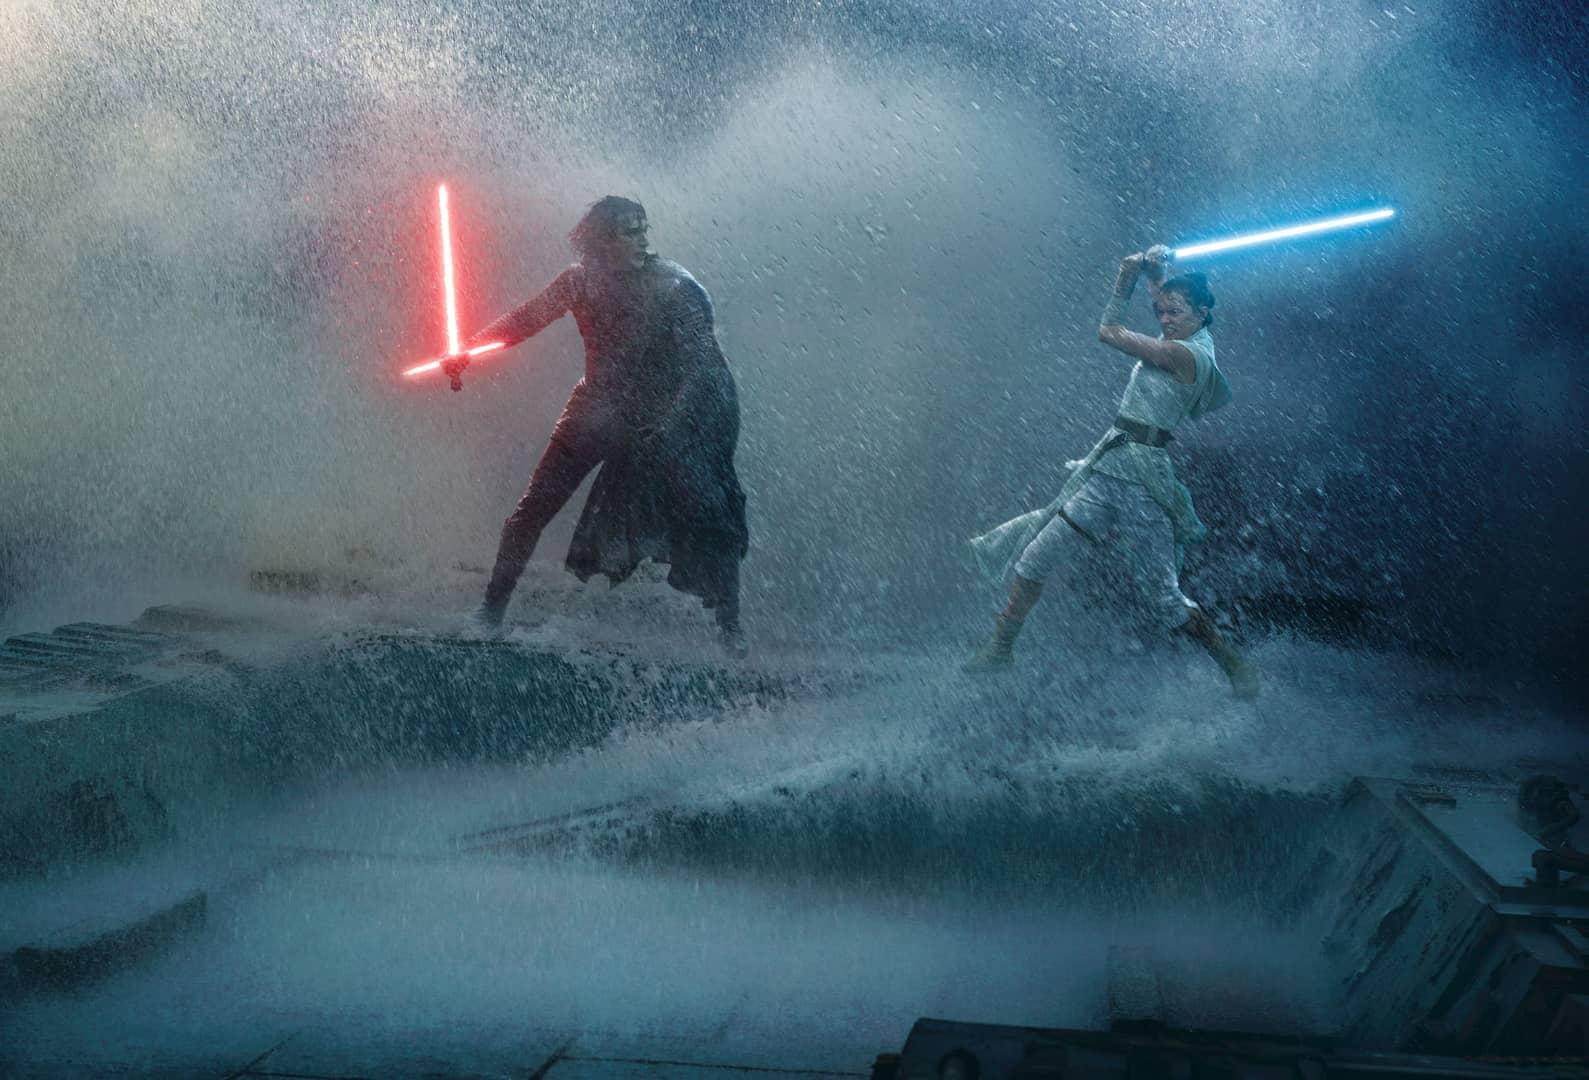 Star Wars rise of Skywalker review